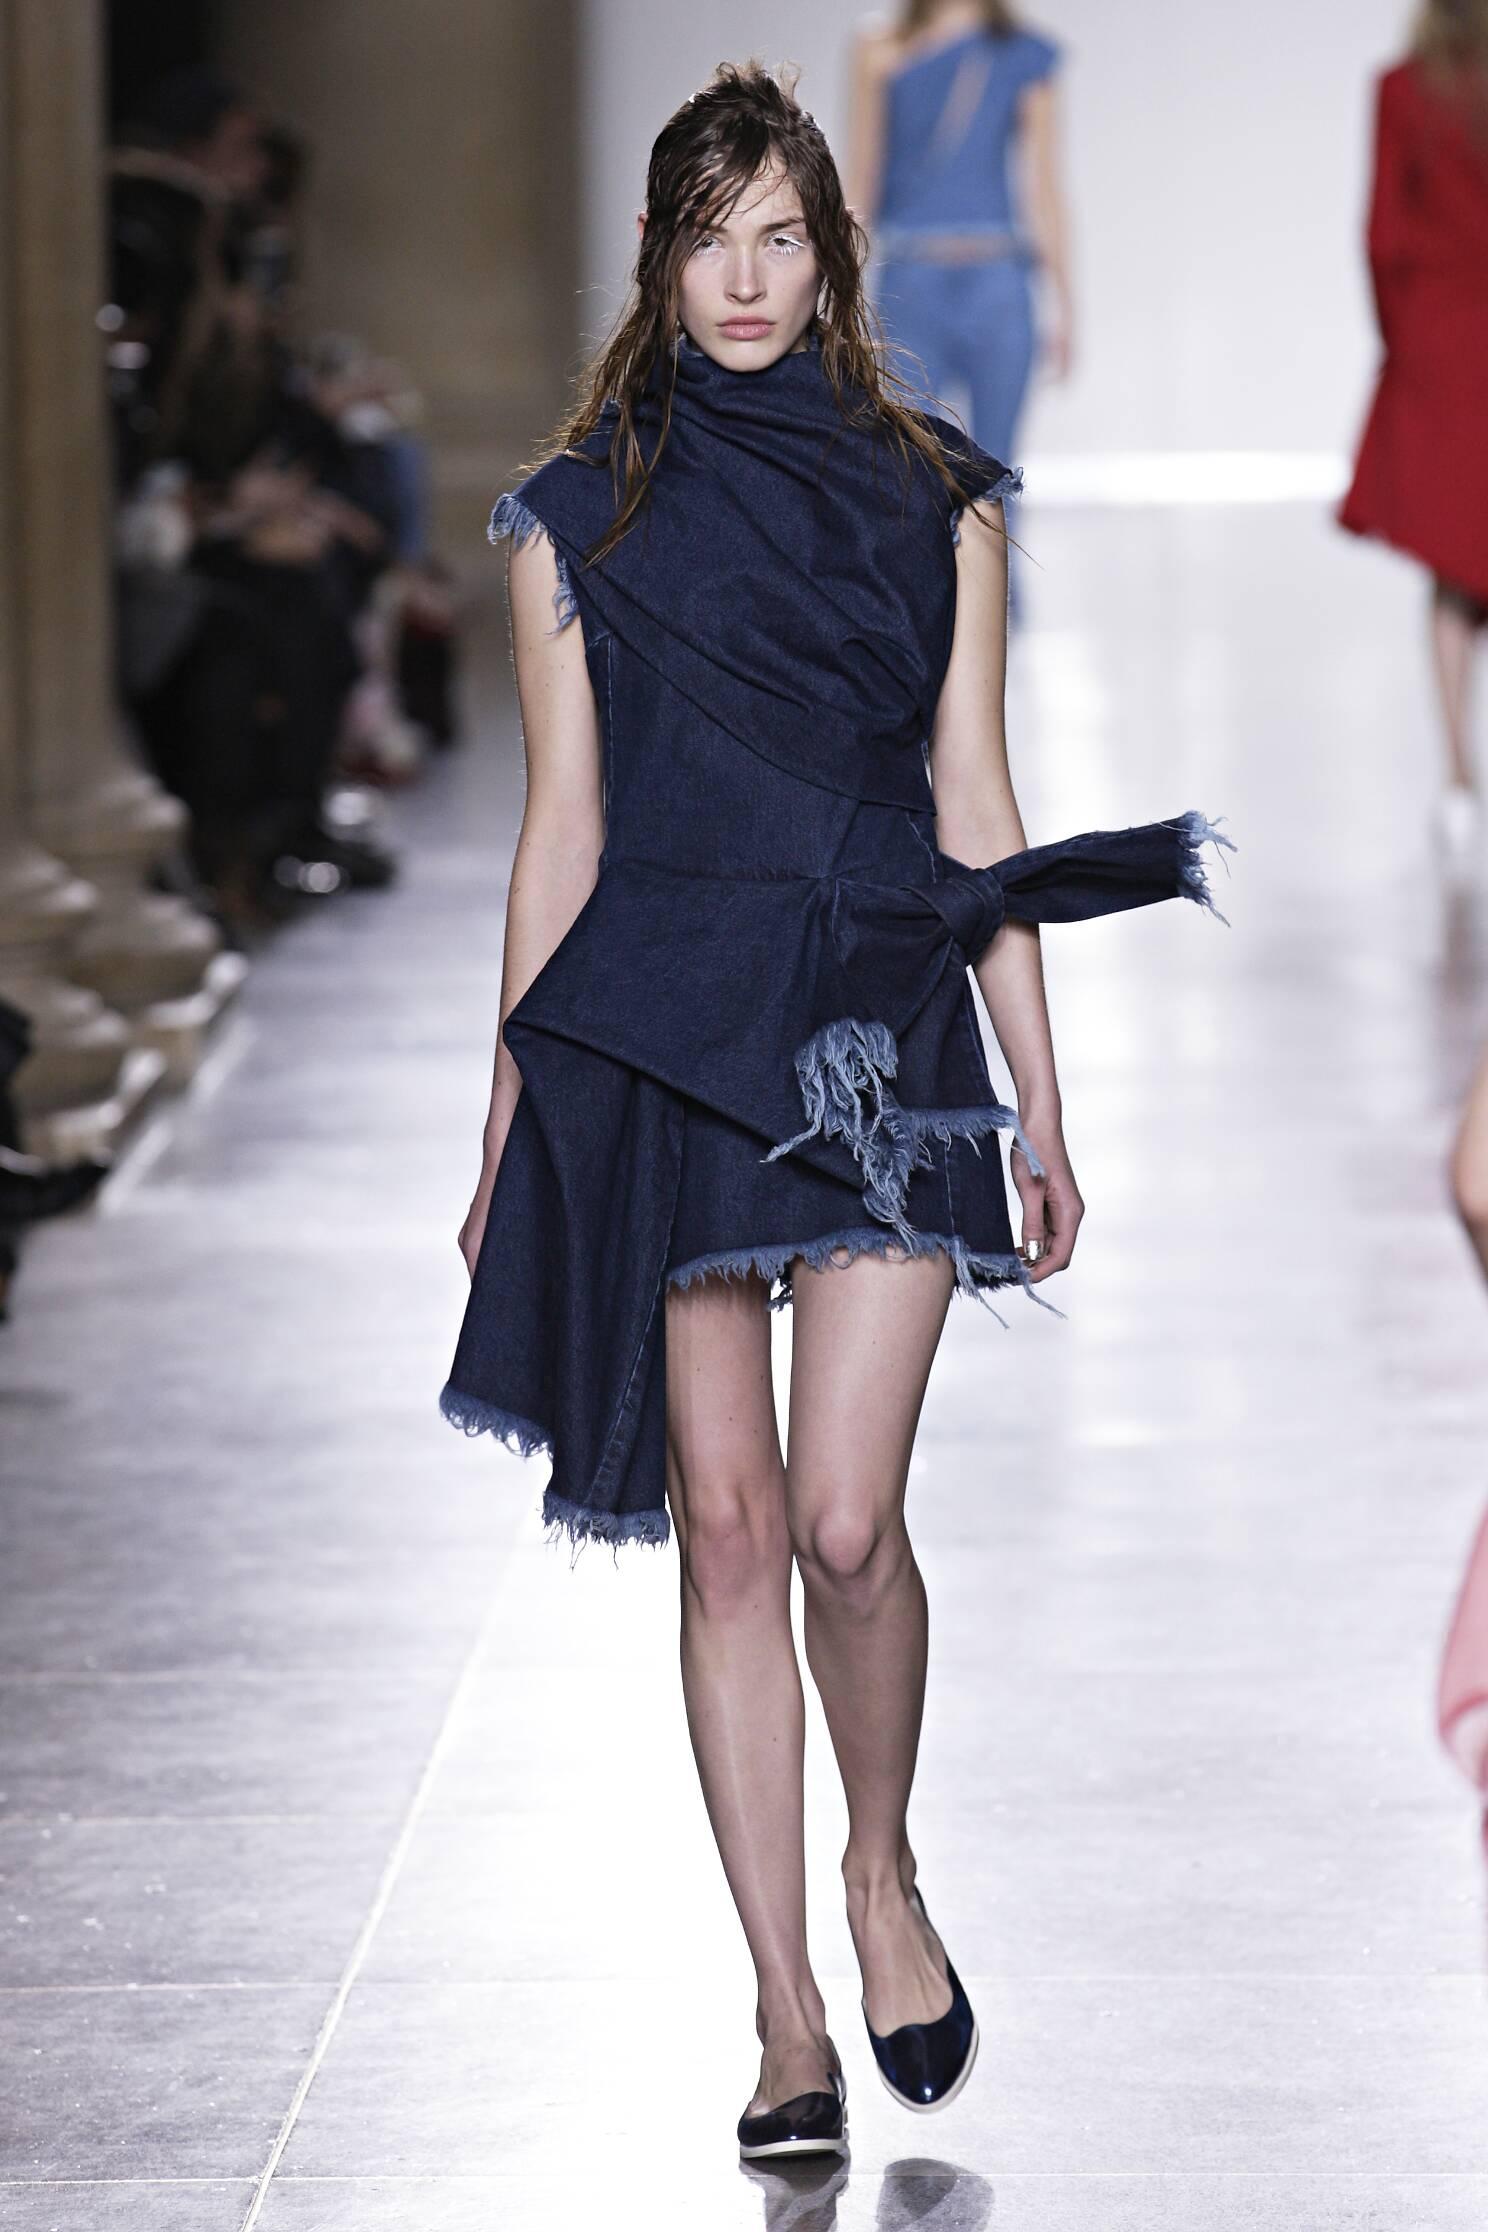 Fall Winter 2015 16 Fashion Collection Marques Almeida